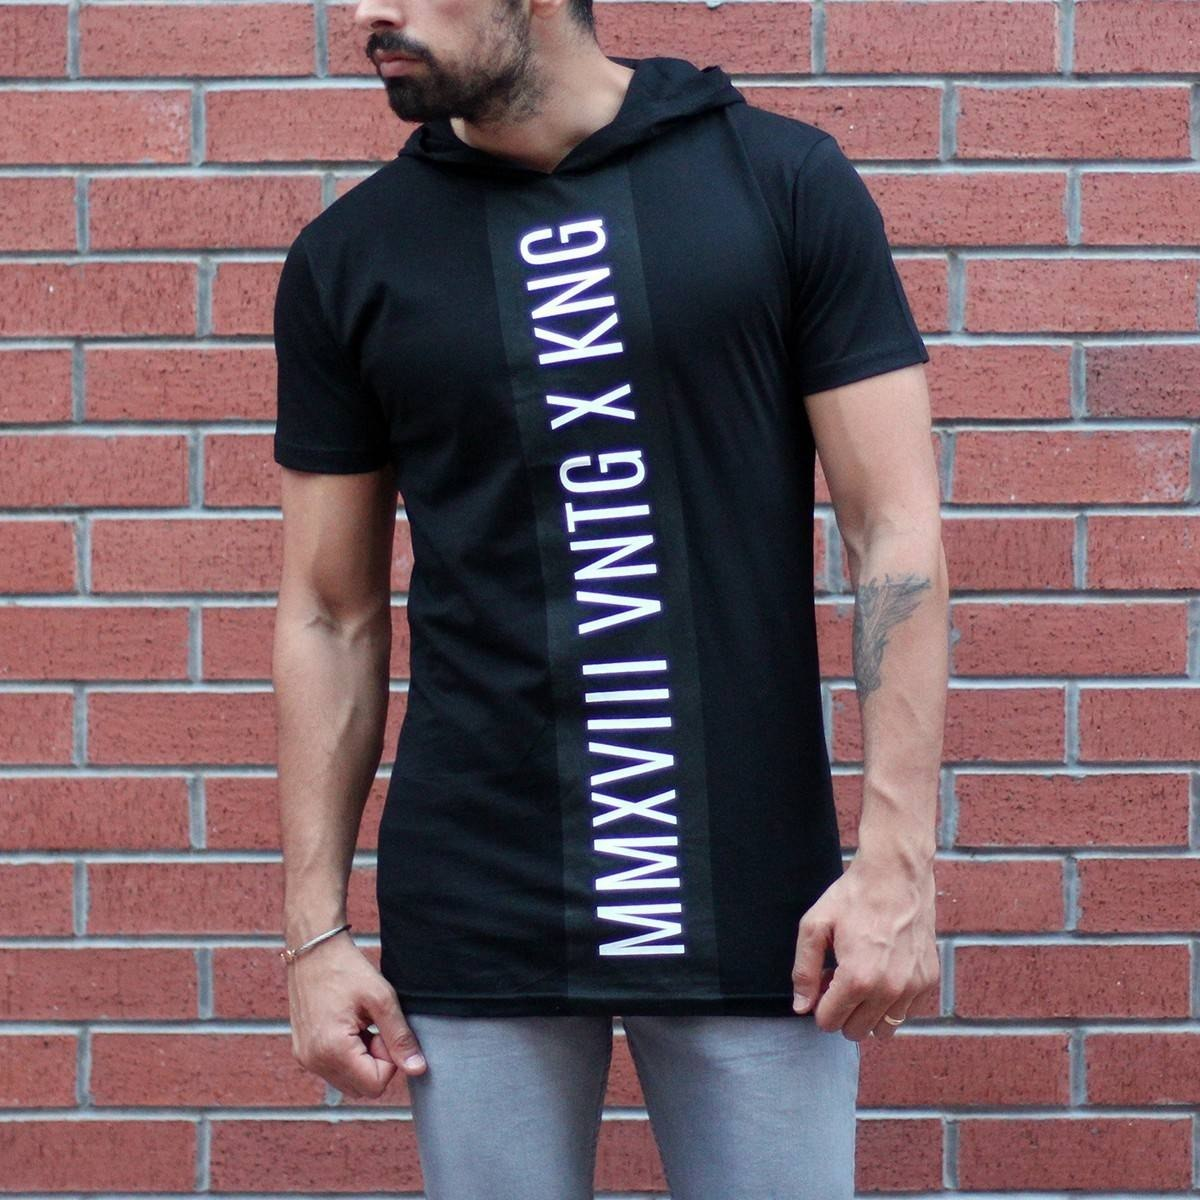 Men's King Printed Tall Hooded T-Shirt Black MV T-shirt Collection - 1